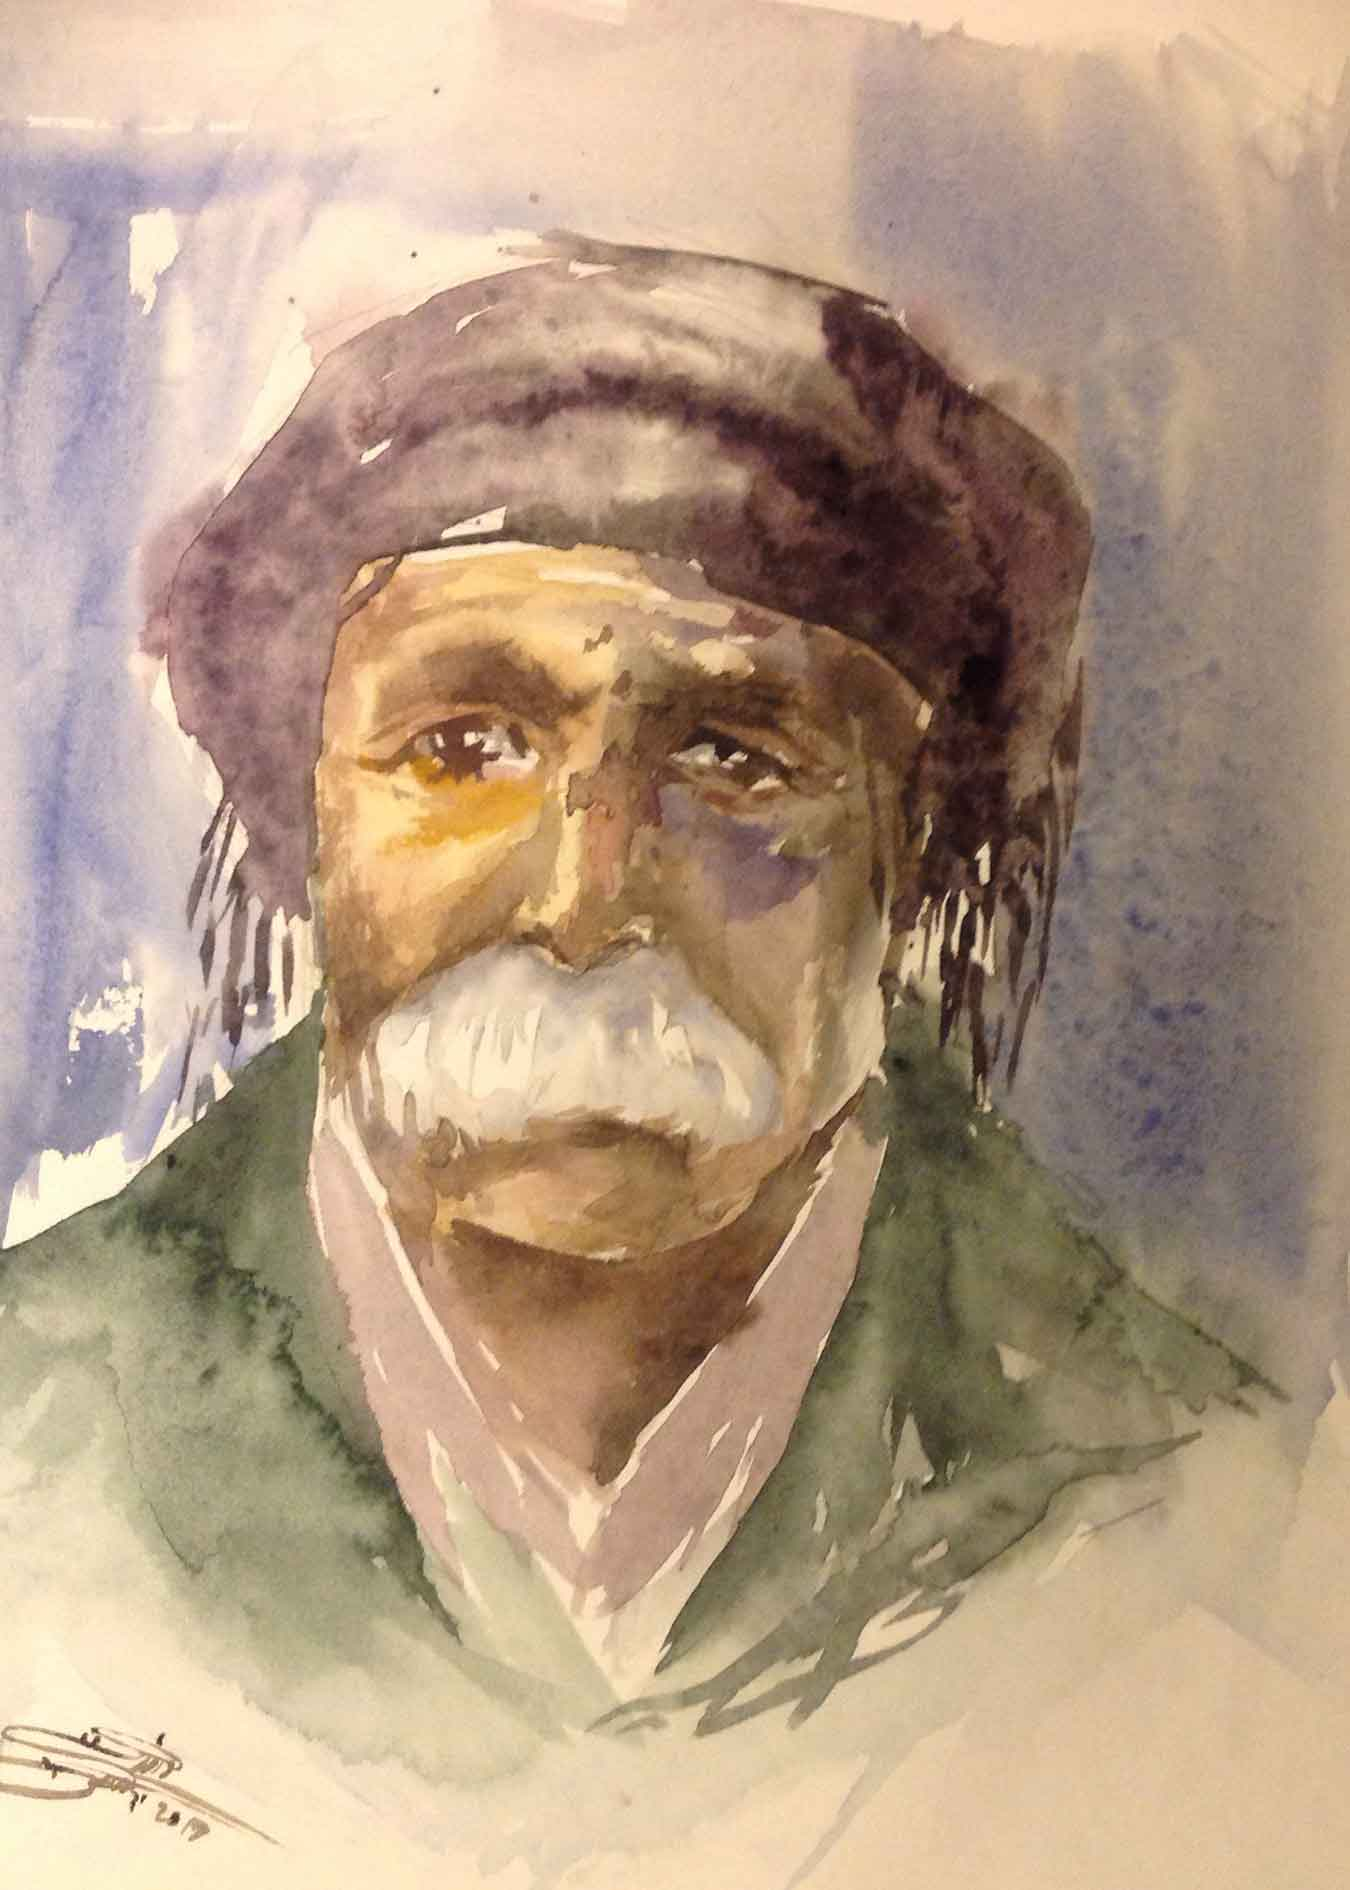 'The Kordish Earthquake Man'